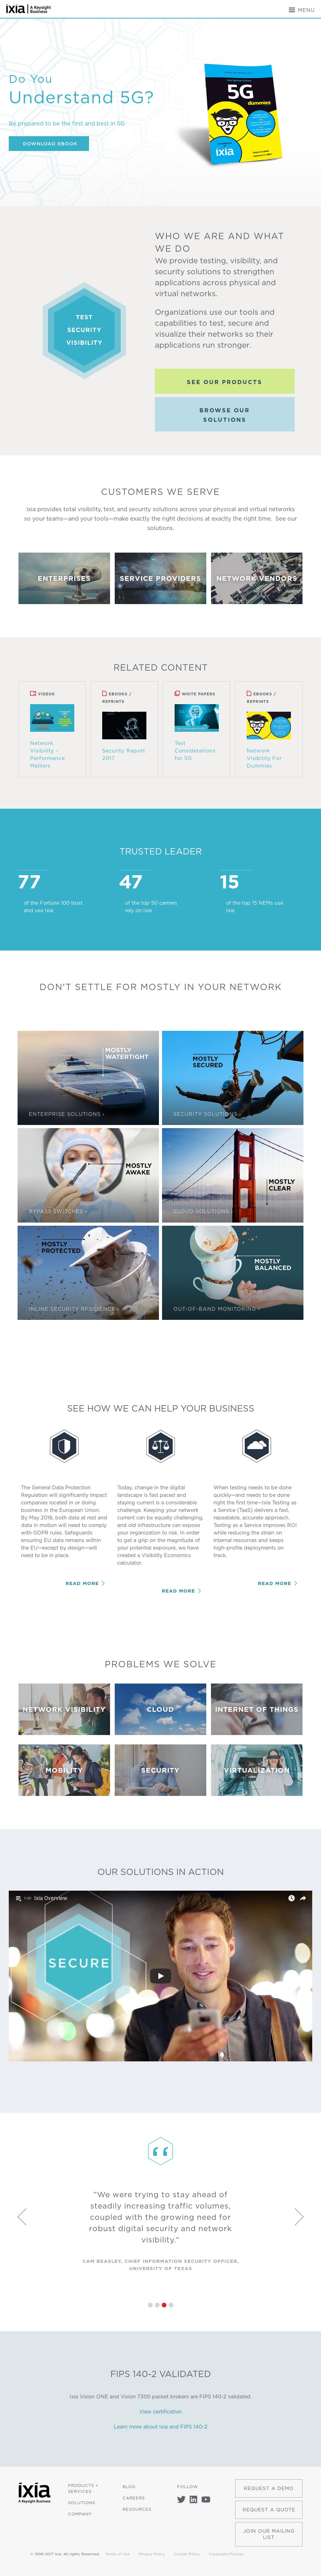 Ixia Competitors, Revenue and Employees - Owler Company Profile